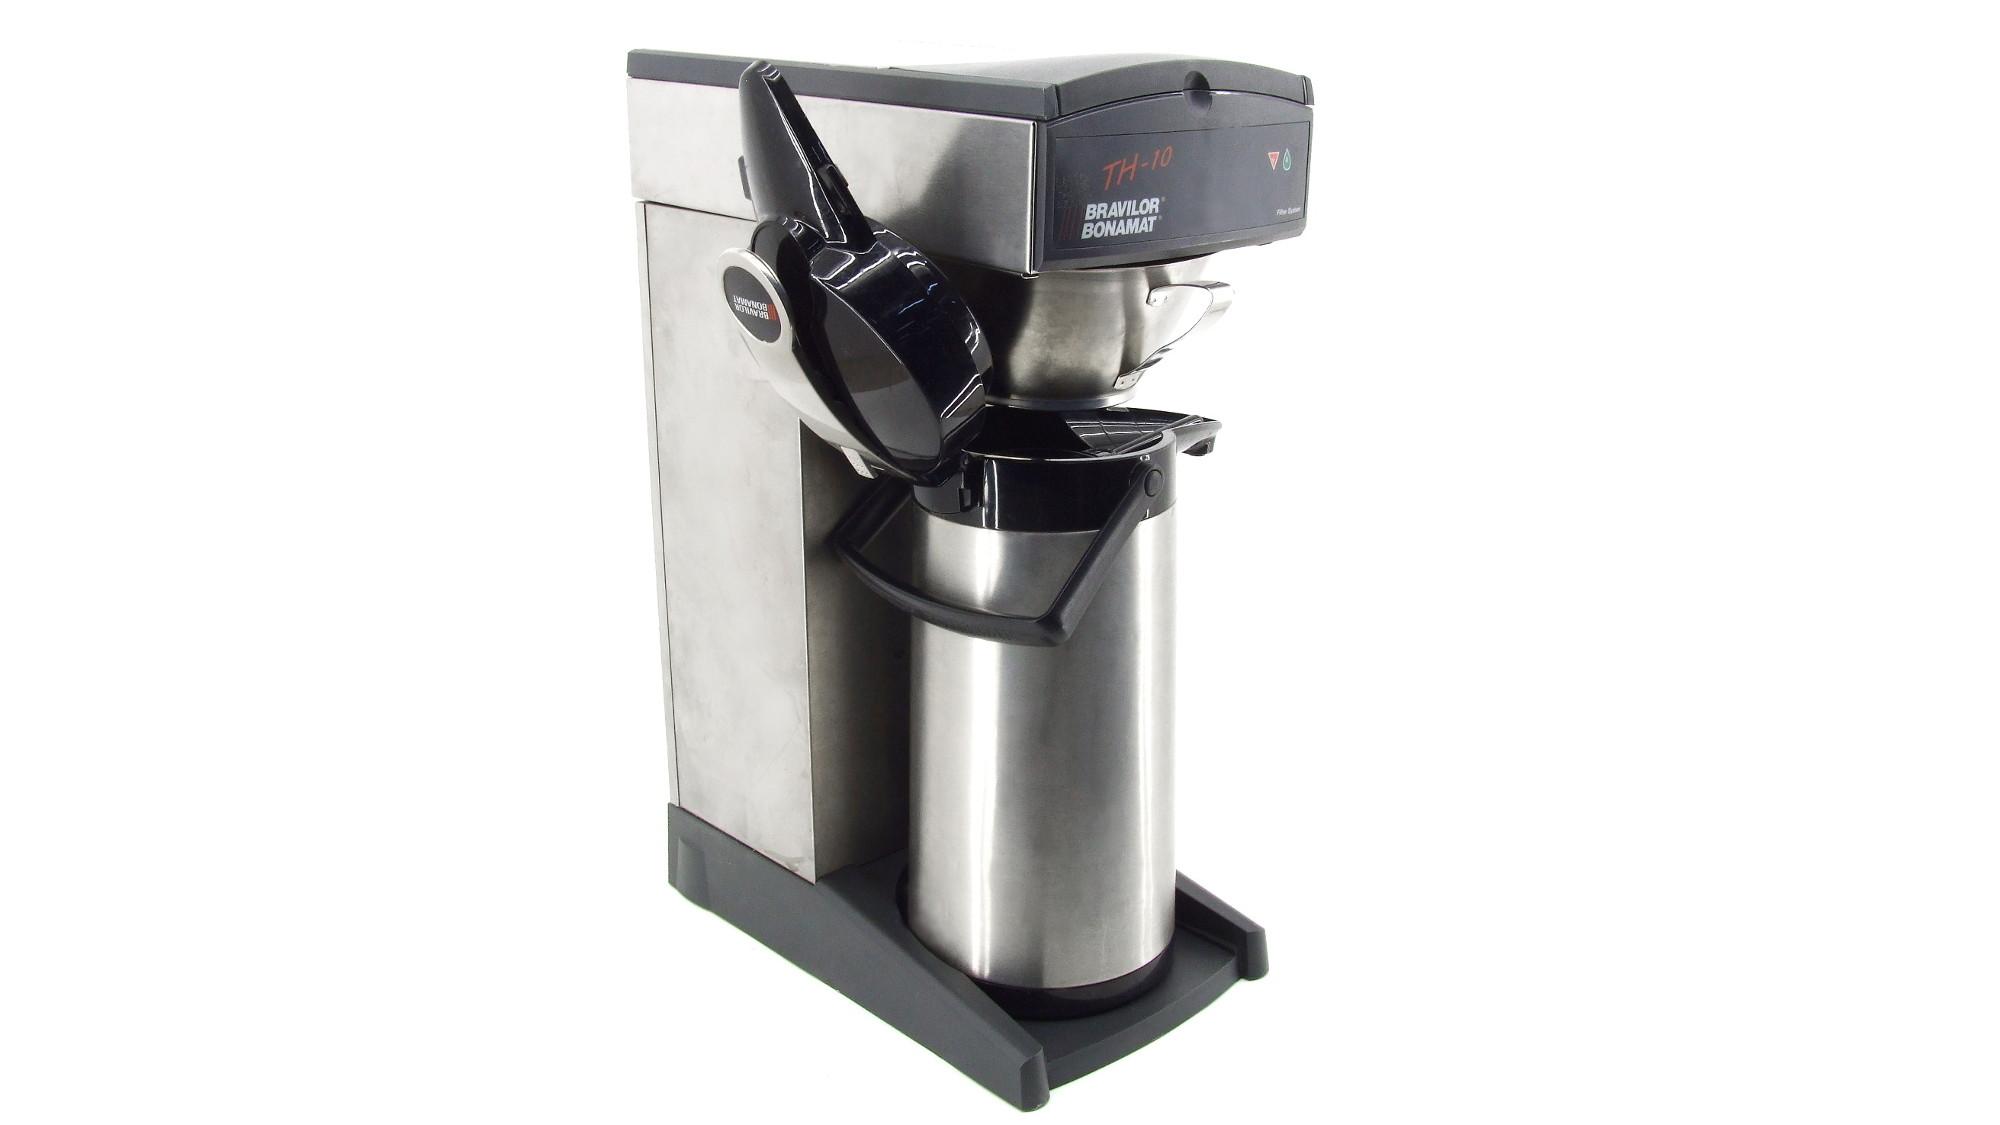 Kaffeemaschine leihen